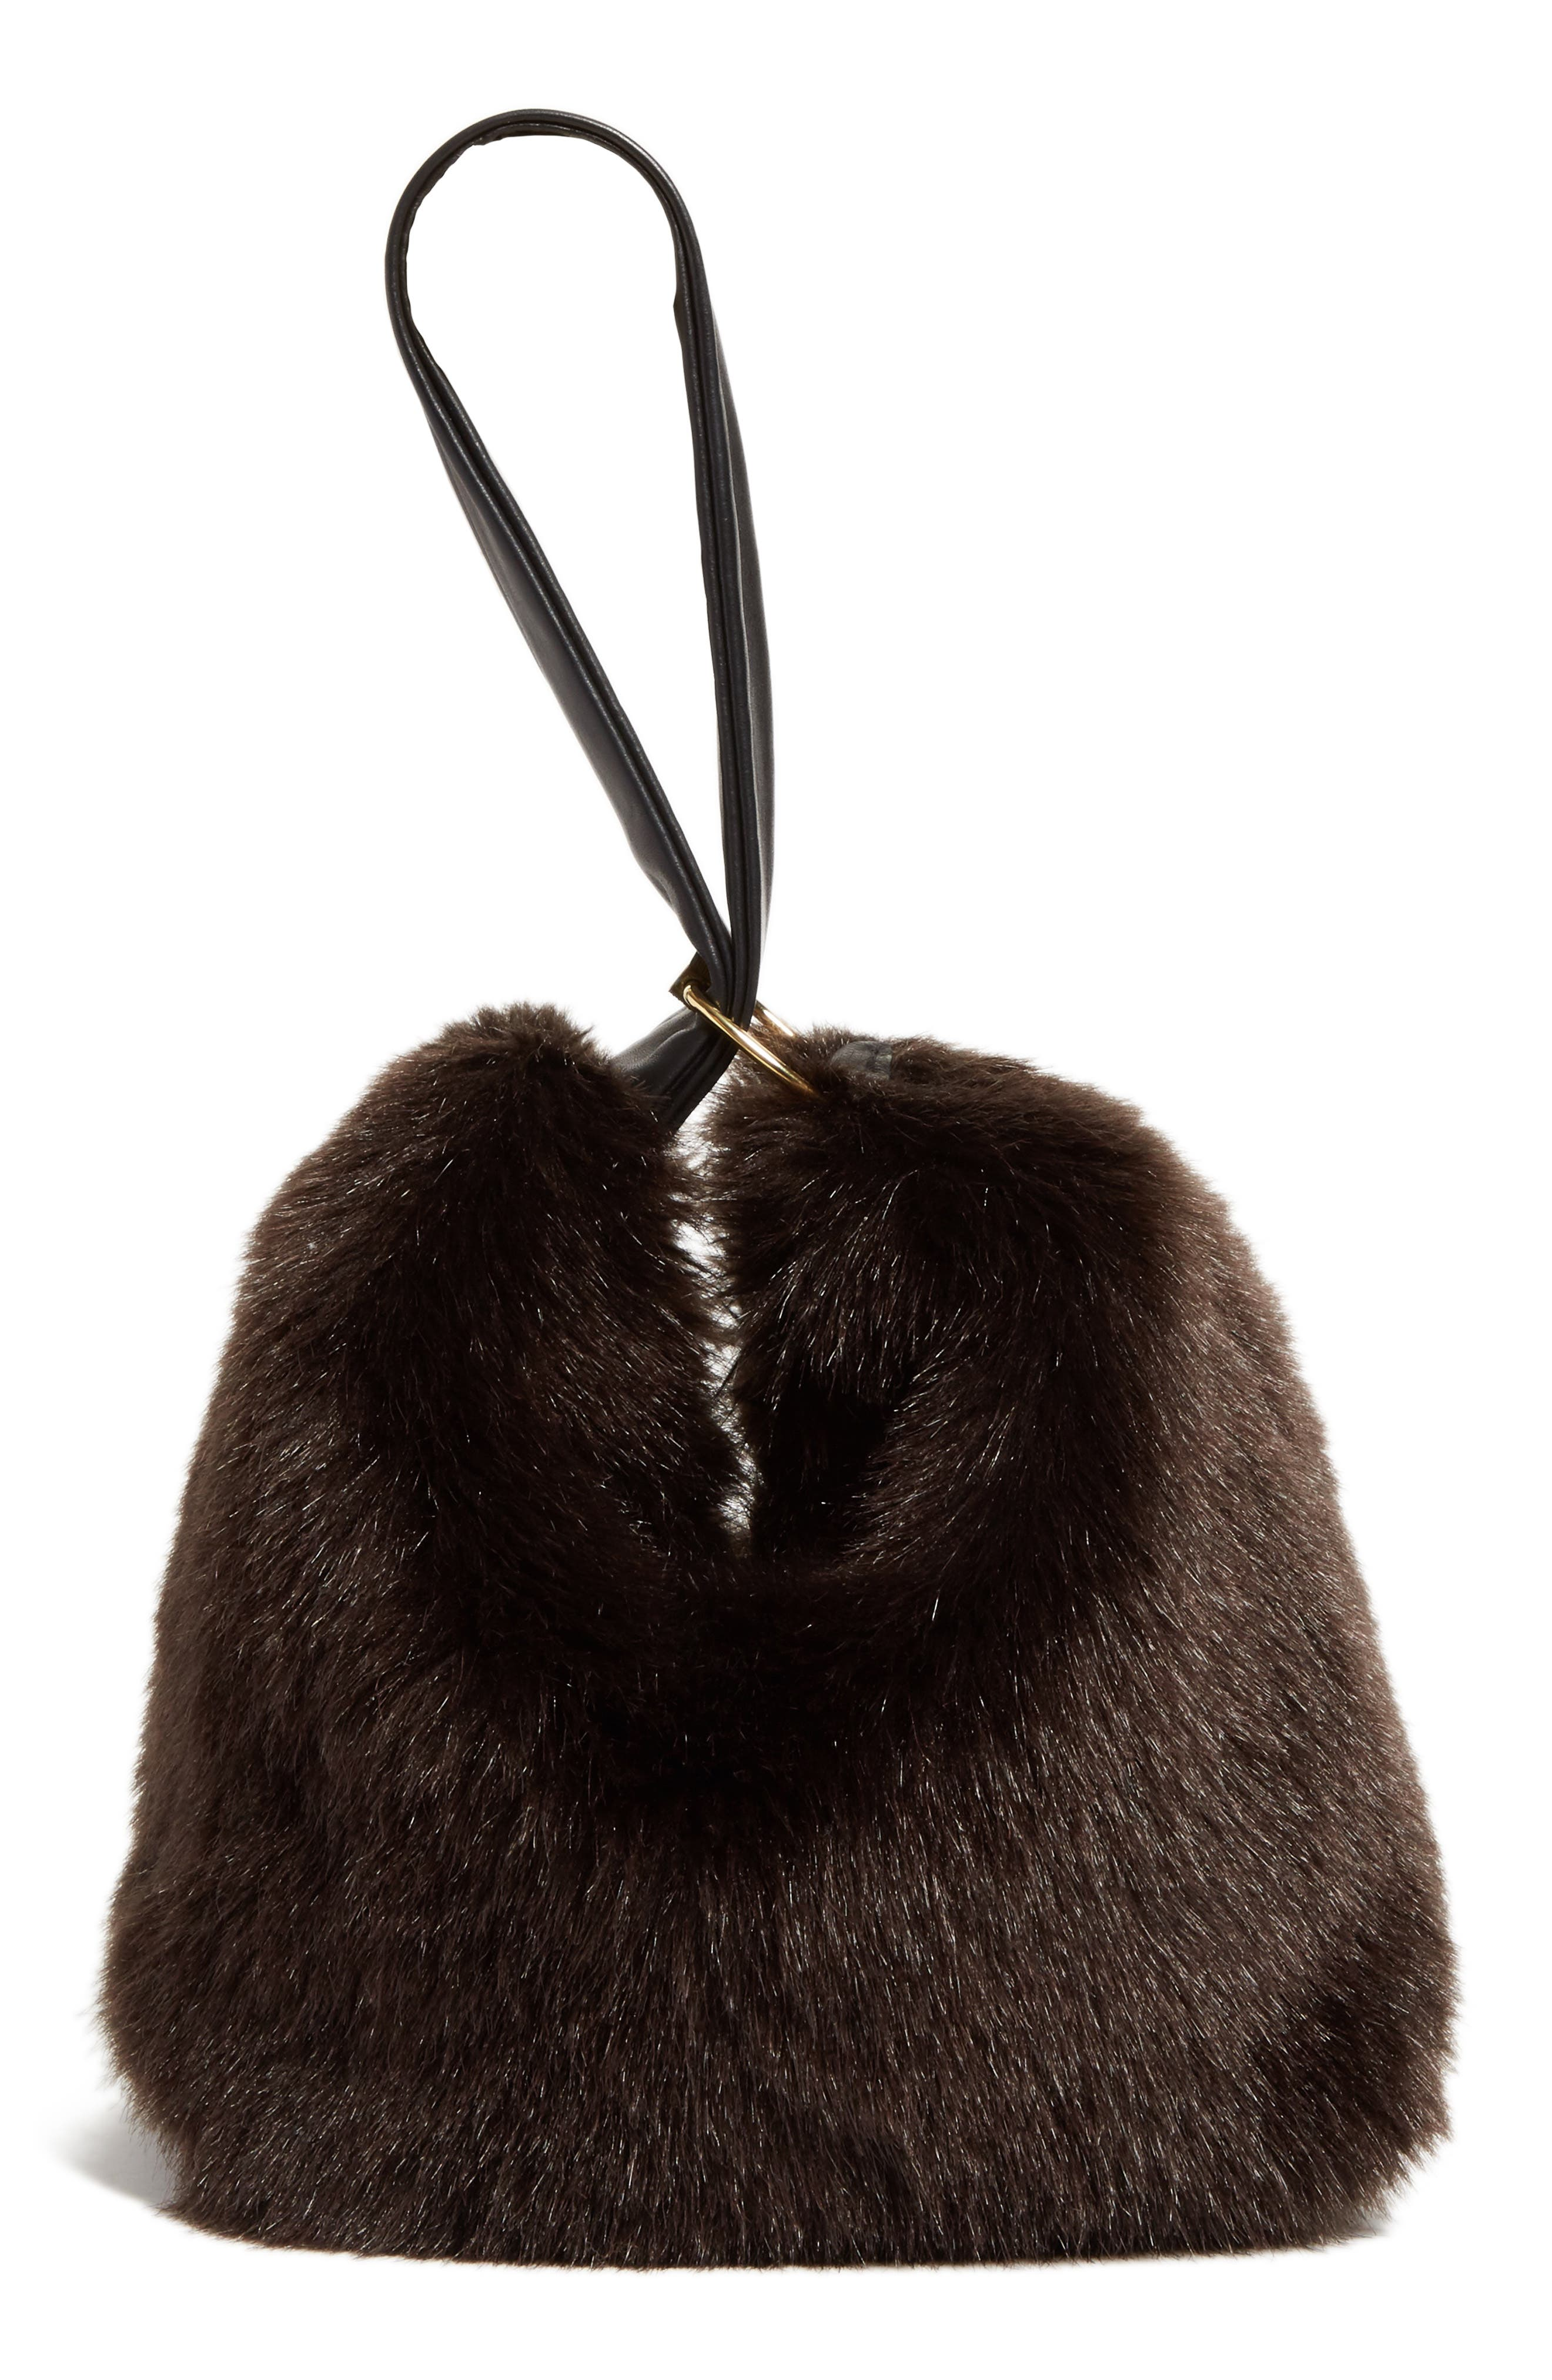 Victoria Beckham Tissue Pouch Faux Fur Bag